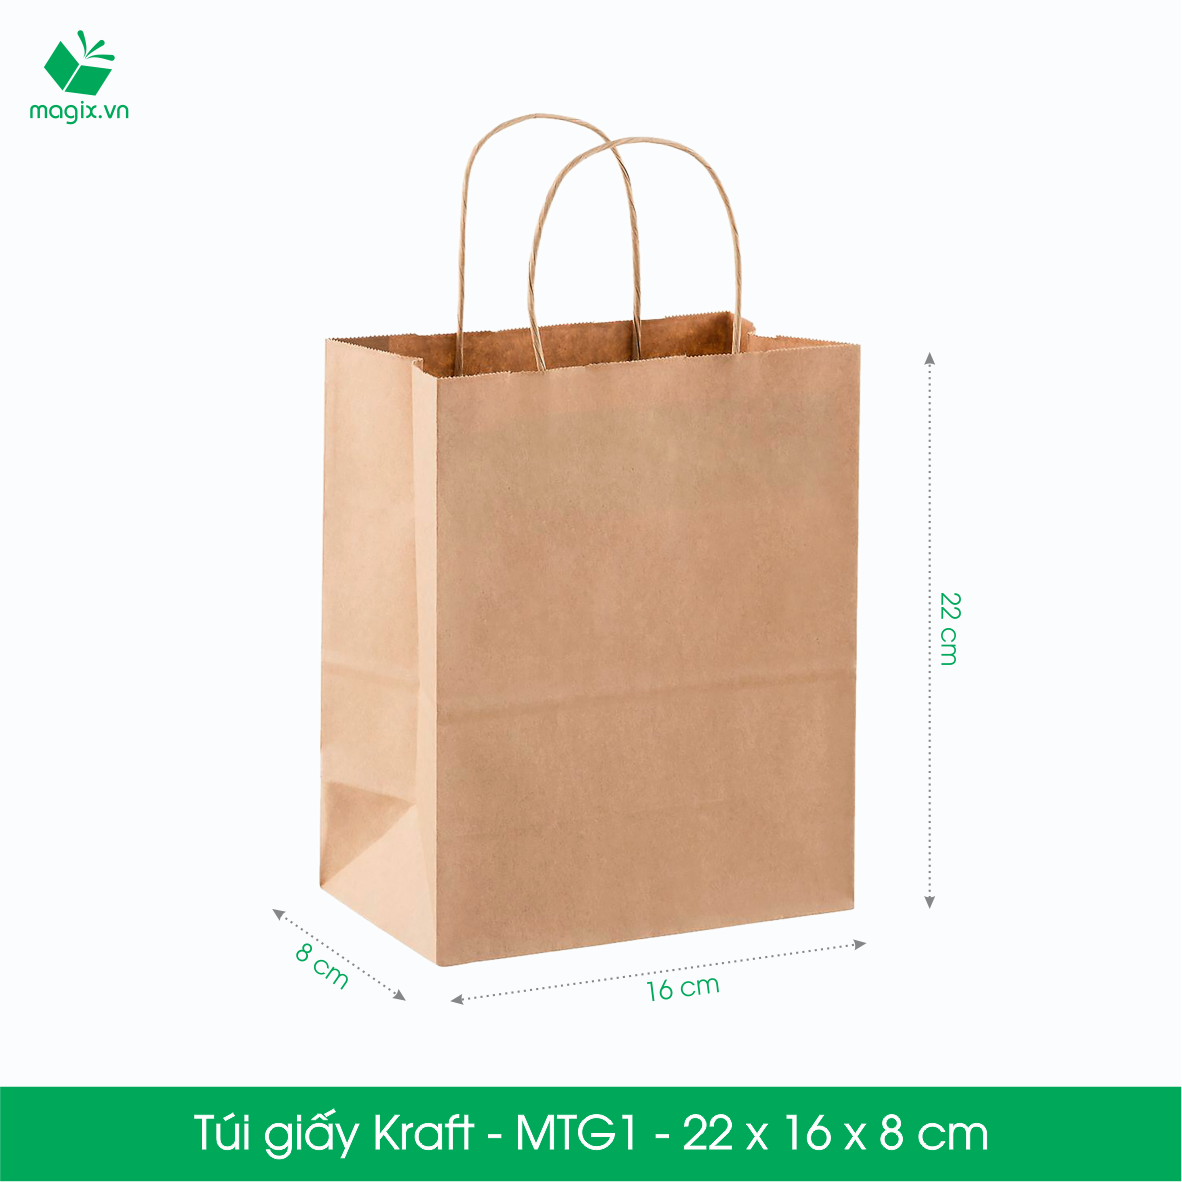 MTG1 - 22x16x8 cm - COMBO 100 TÚI GIẤY KRAFT